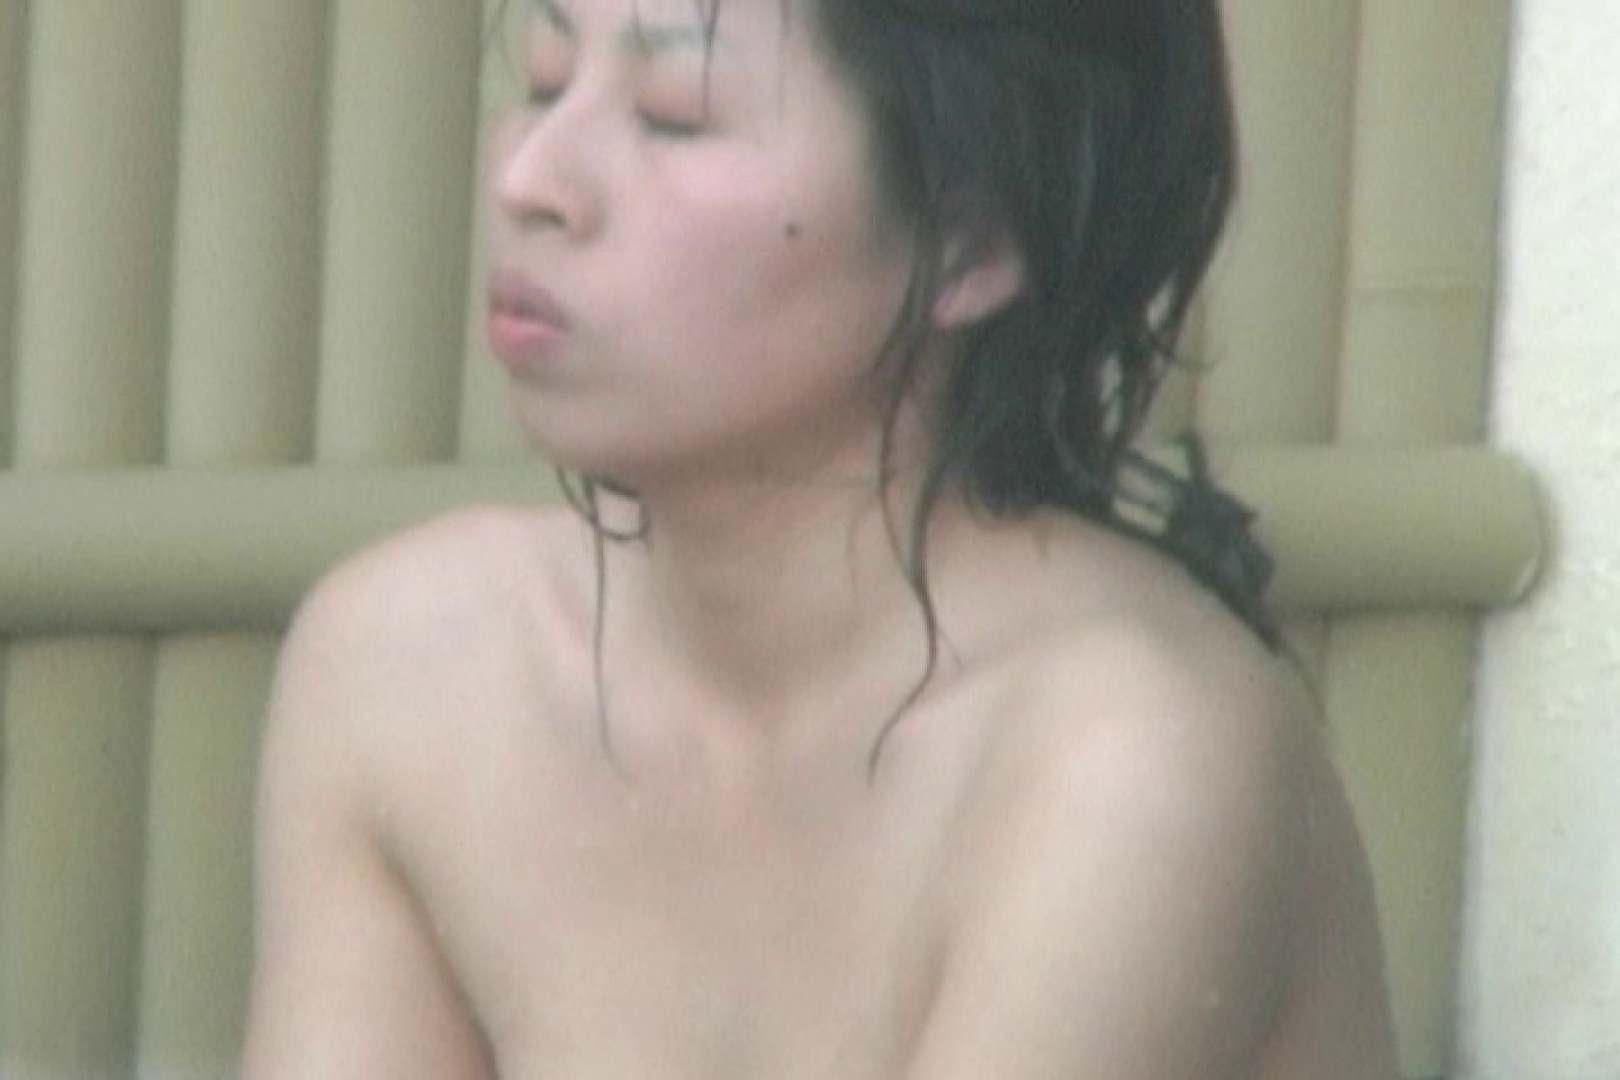 Aquaな露天風呂Vol.589 盗撮 | HなOL  105pic 98